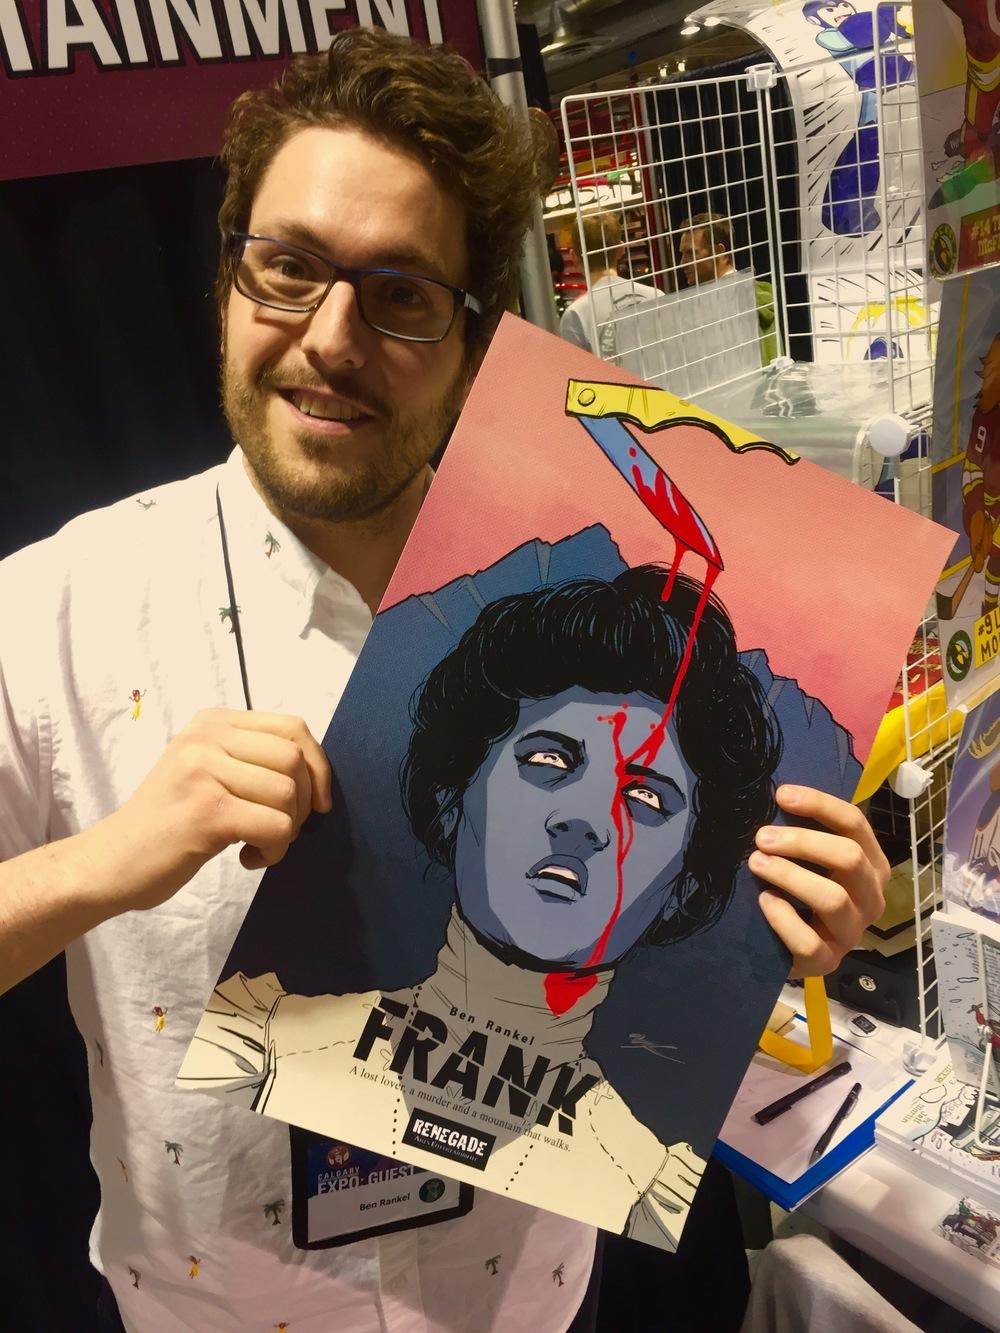 Ben Rankel at the 2016 Calgary Expo. (Photo credit: Chris Doucher/GeekNerdNet)